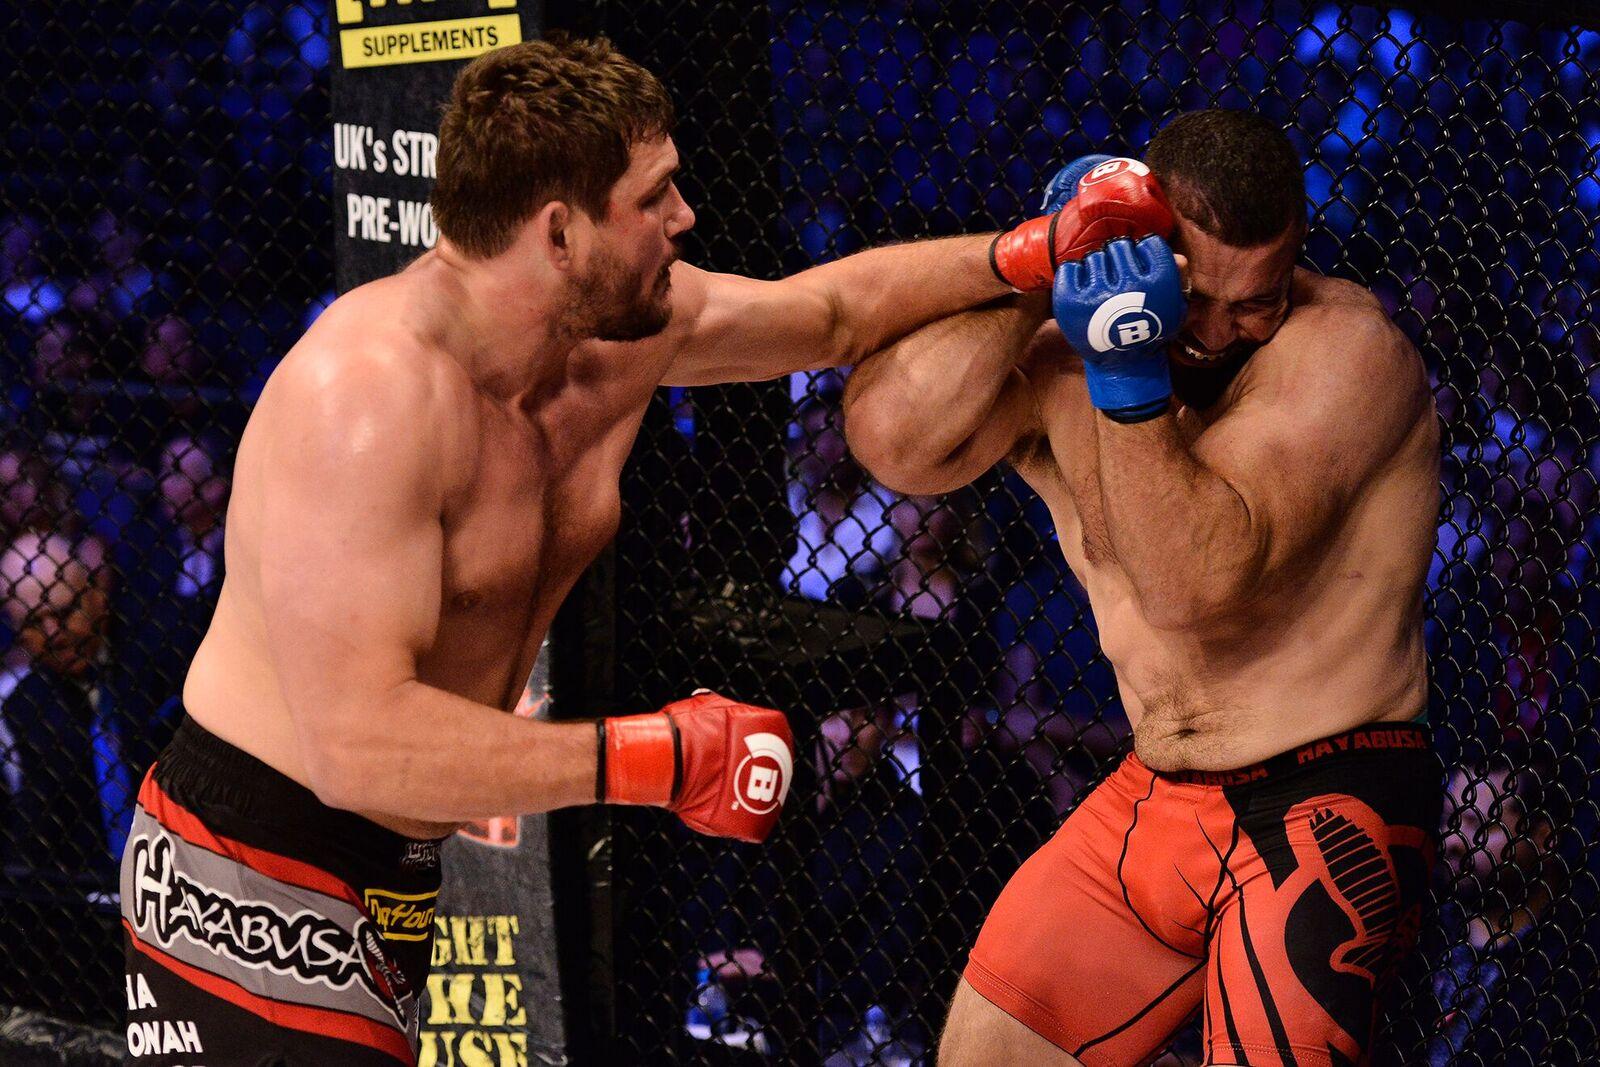 Image Credit: Bellator MMA